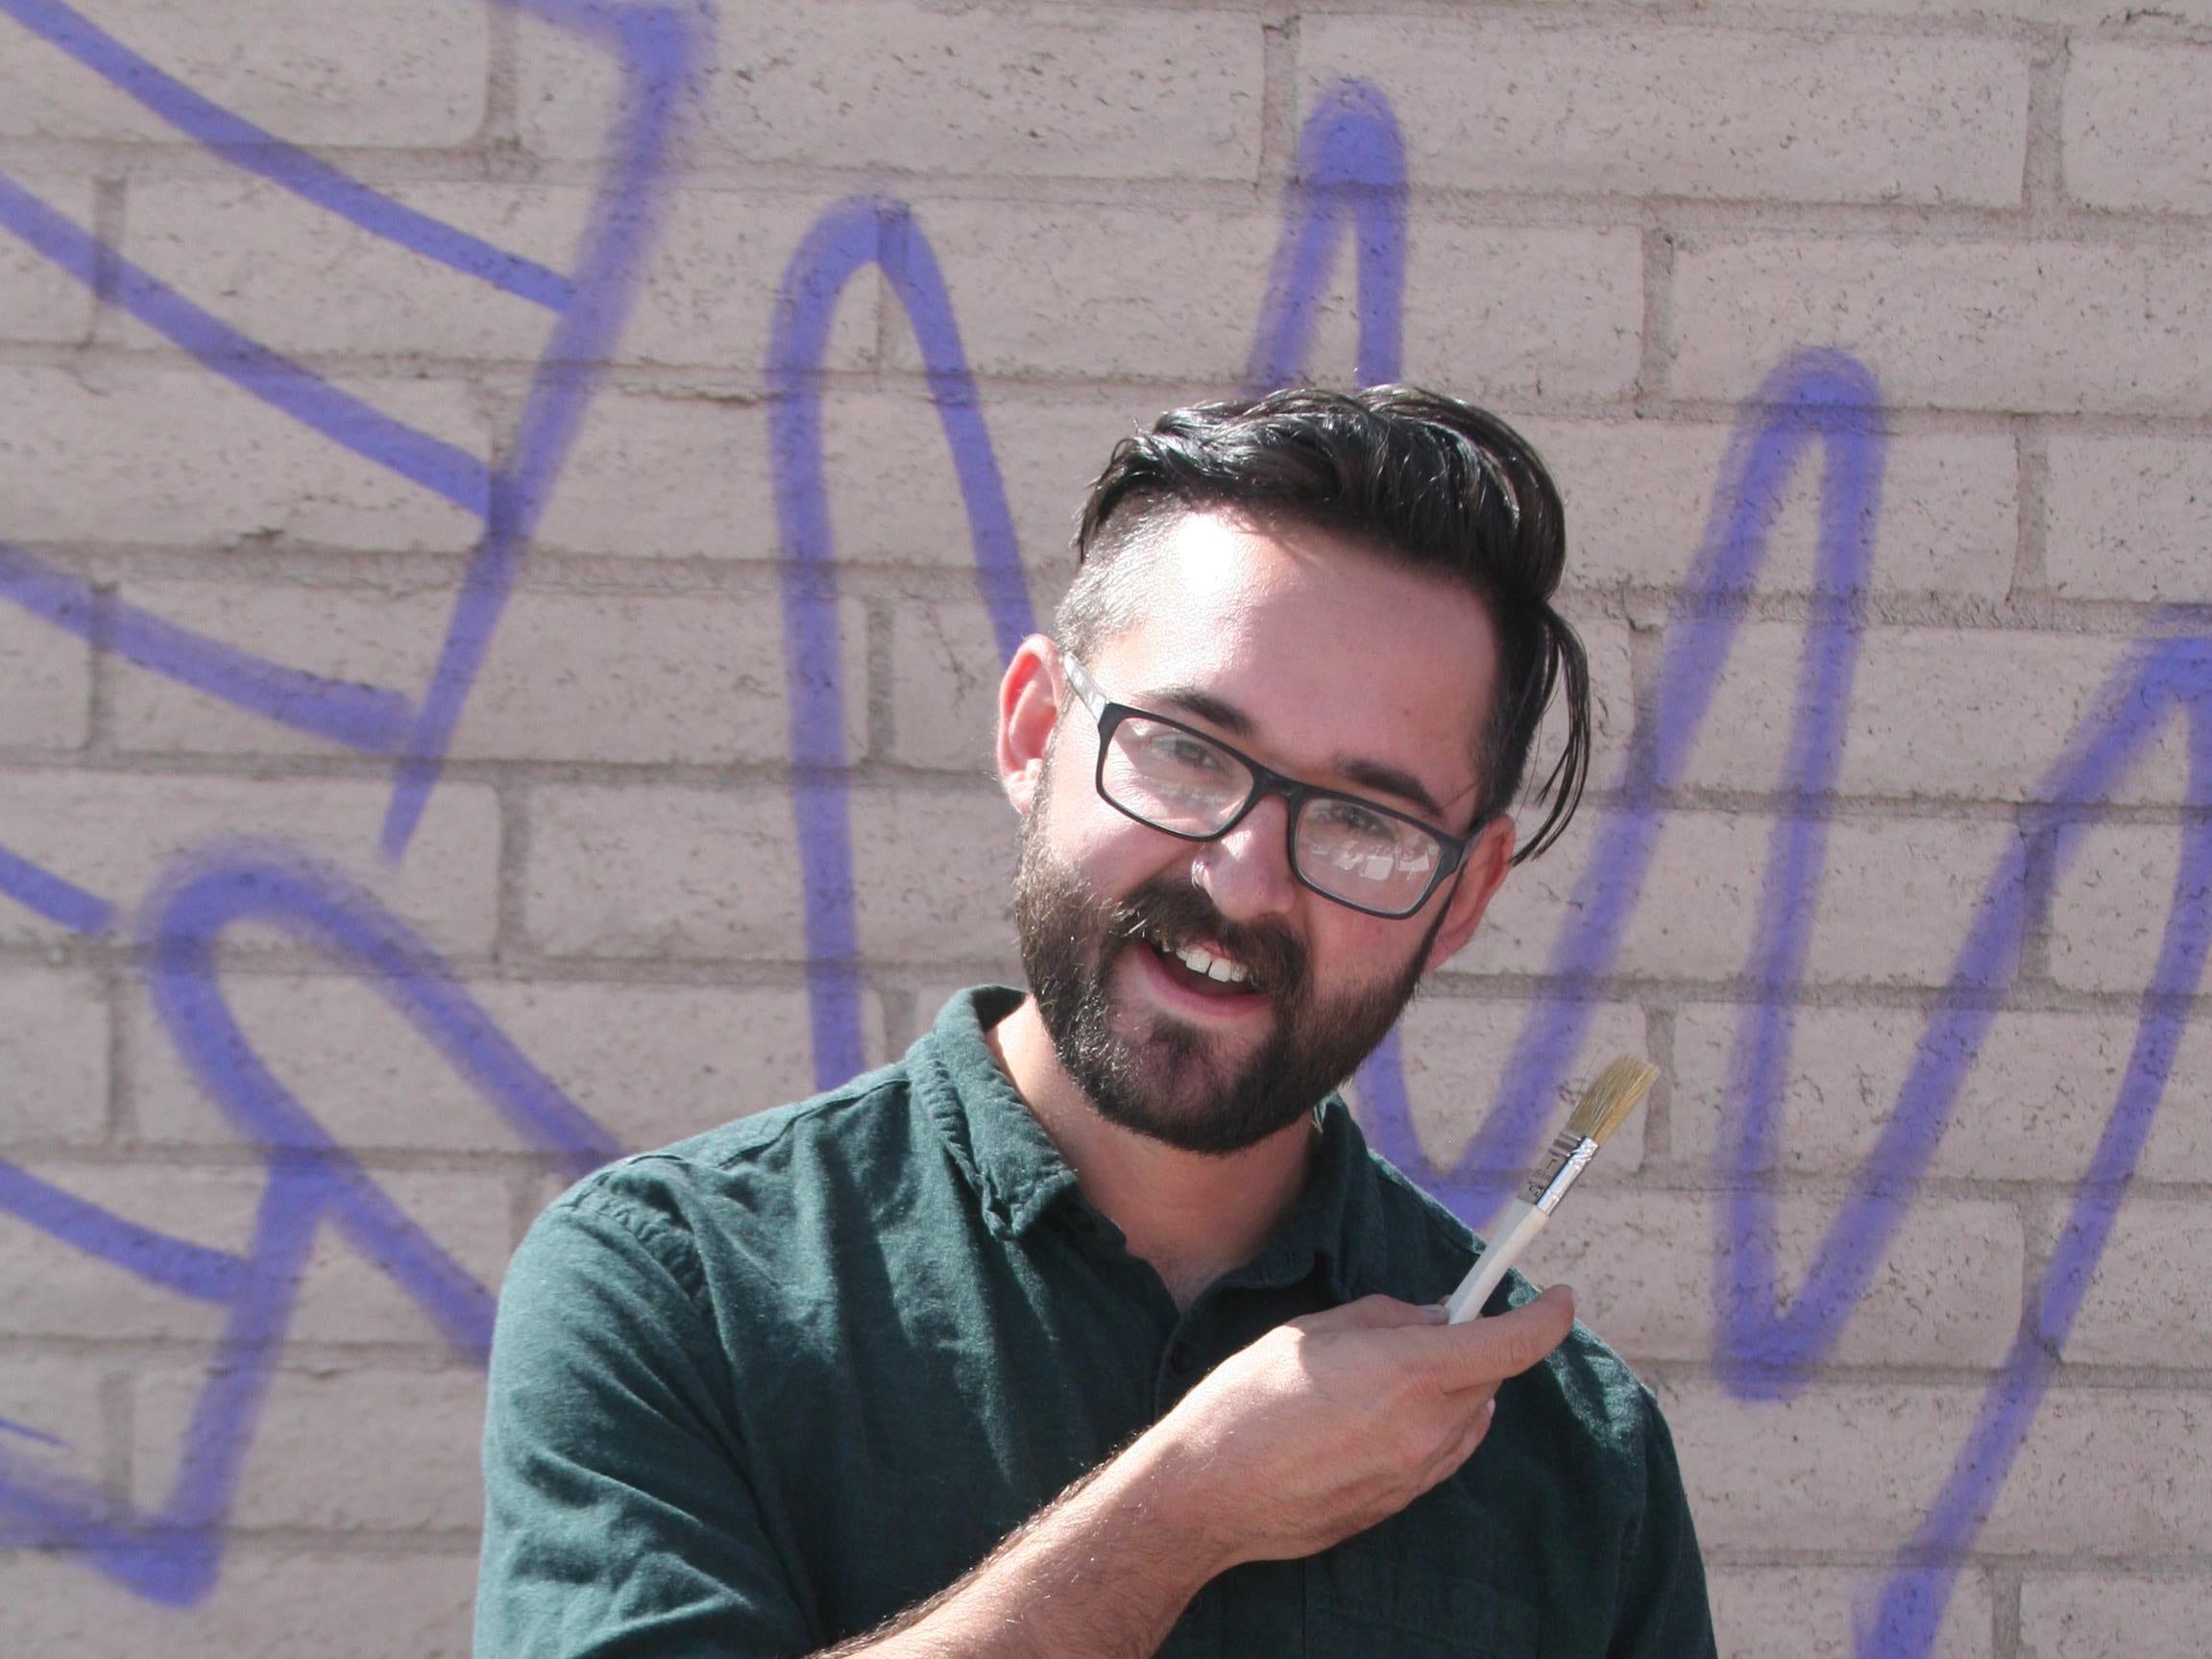 El artista Isaac Caruso es nativo de Phoenix.